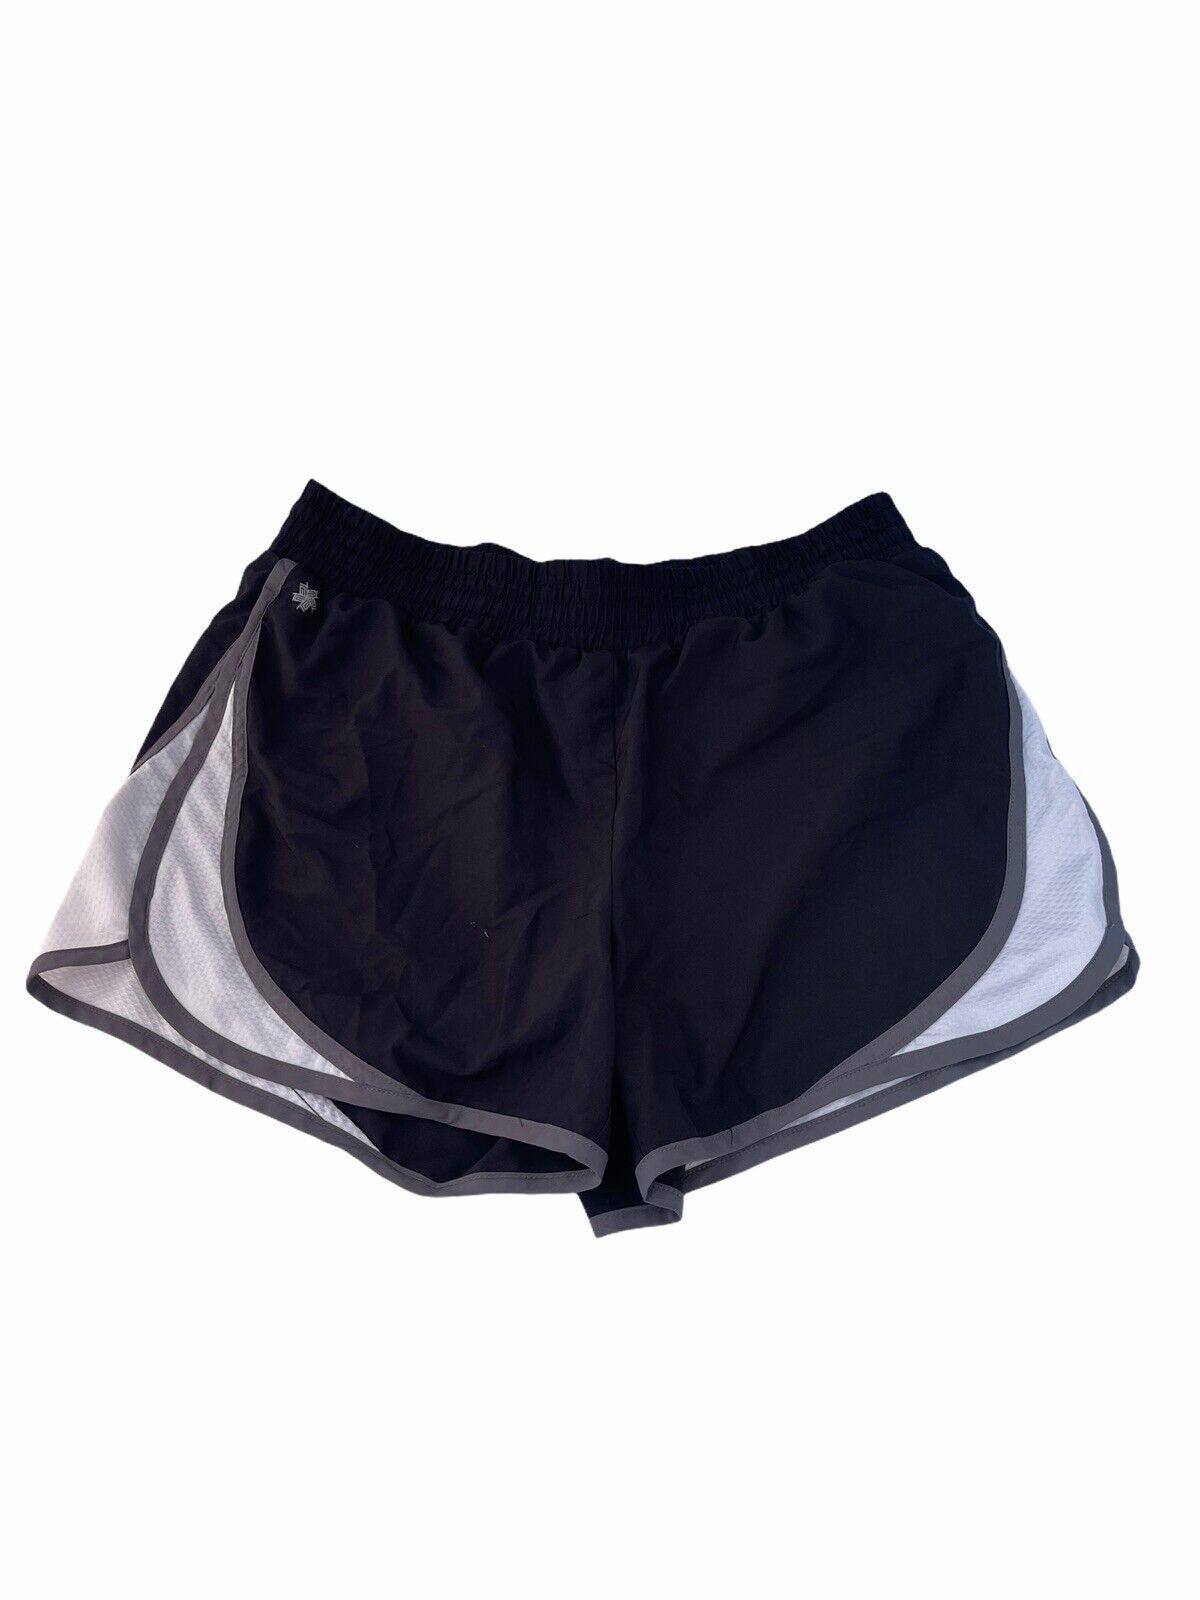 Women's TEK SHORTS Black Shorts with White & Grey Size Medium